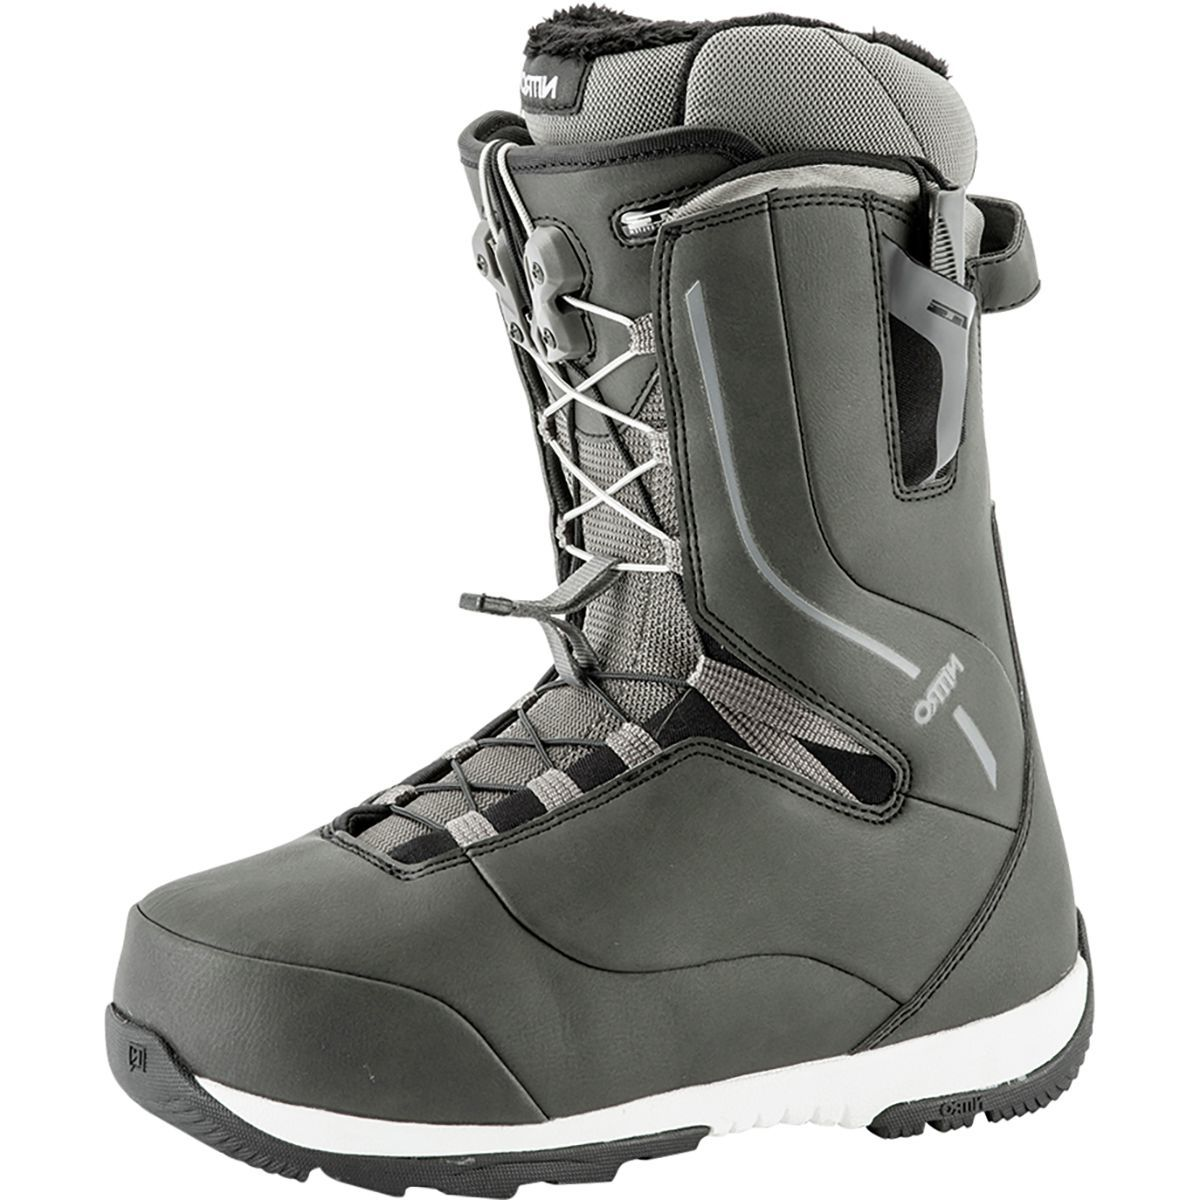 Nitro Crown TLS Snowboard Boot - Women's